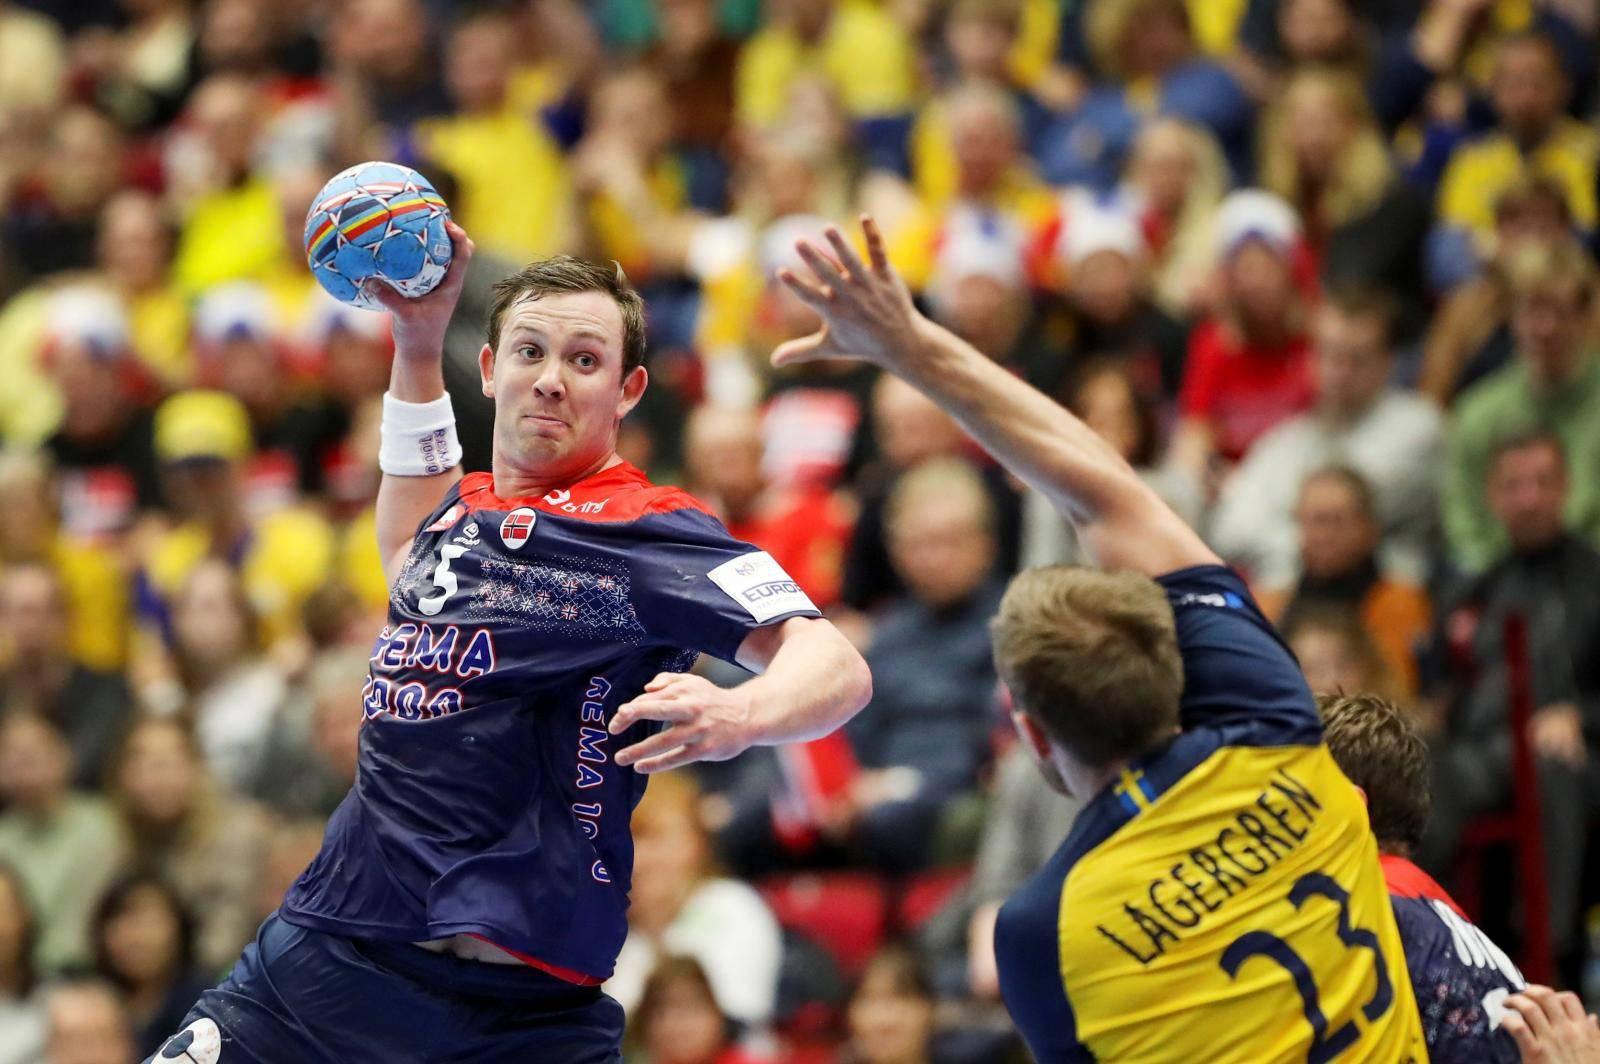 Handball - 2020 European Handball Championship - Main Round Group 2 - Norway v Sweden